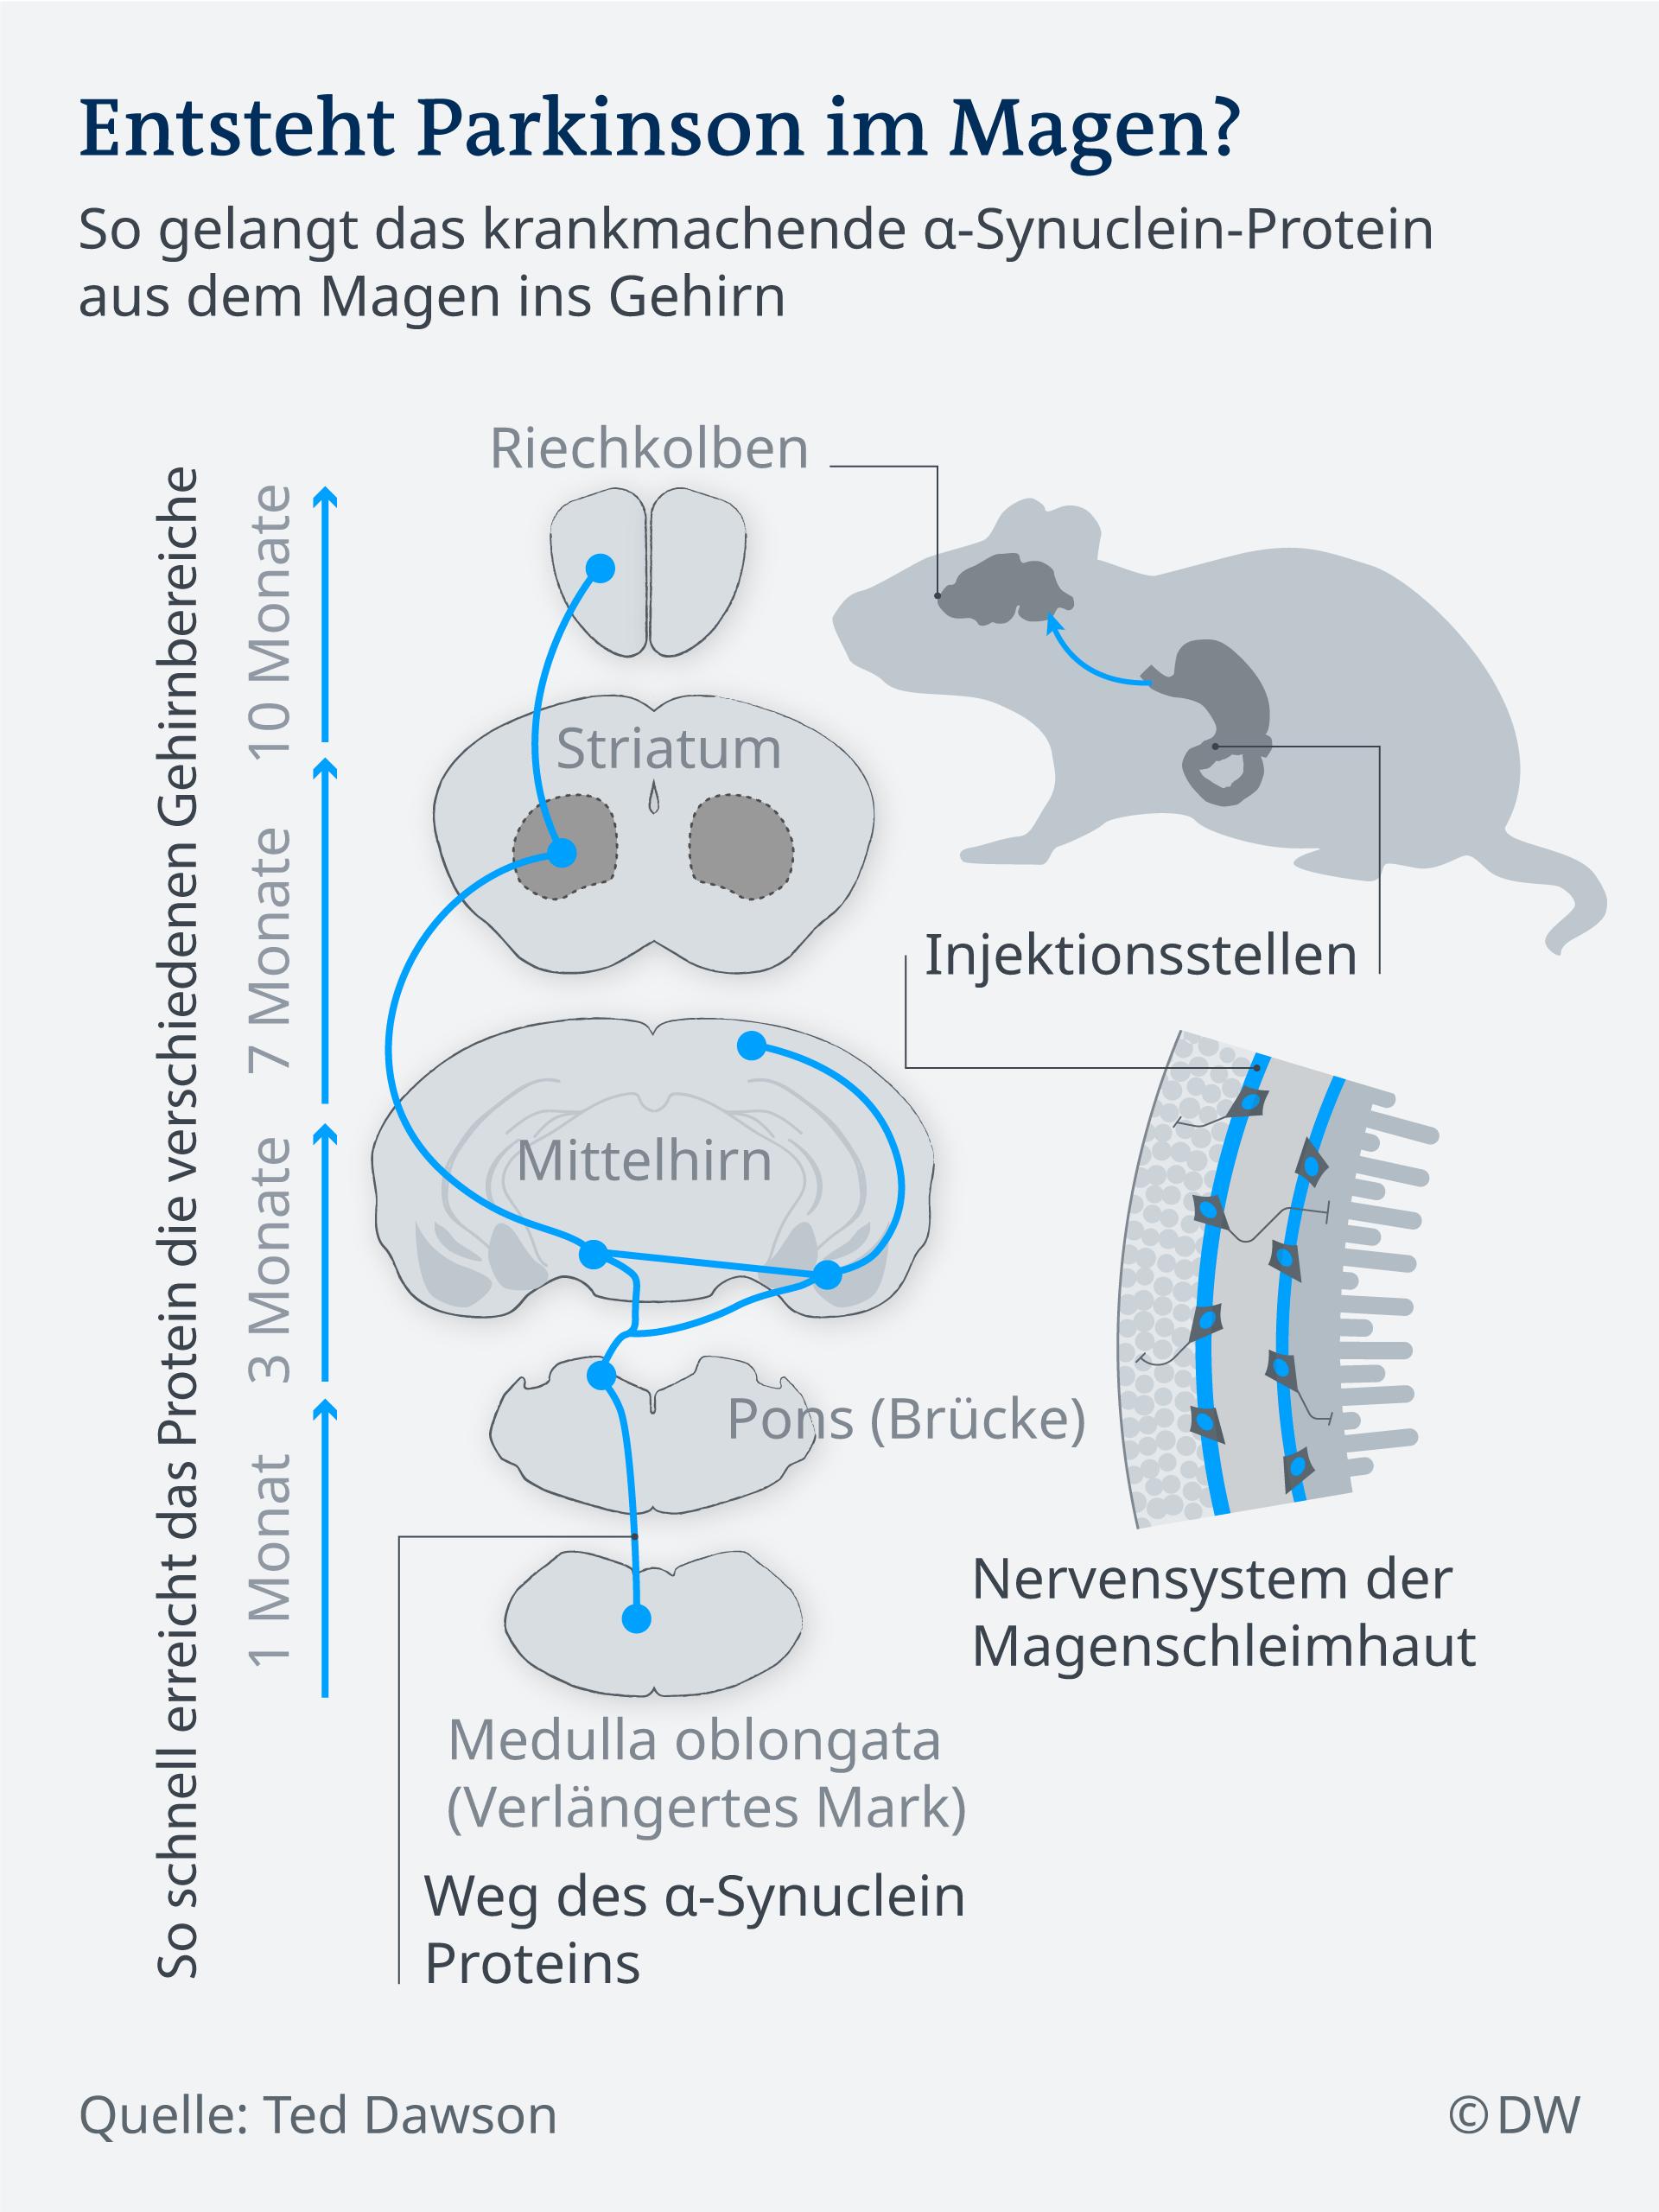 Infografik entsteht Parkinson im Magen DE